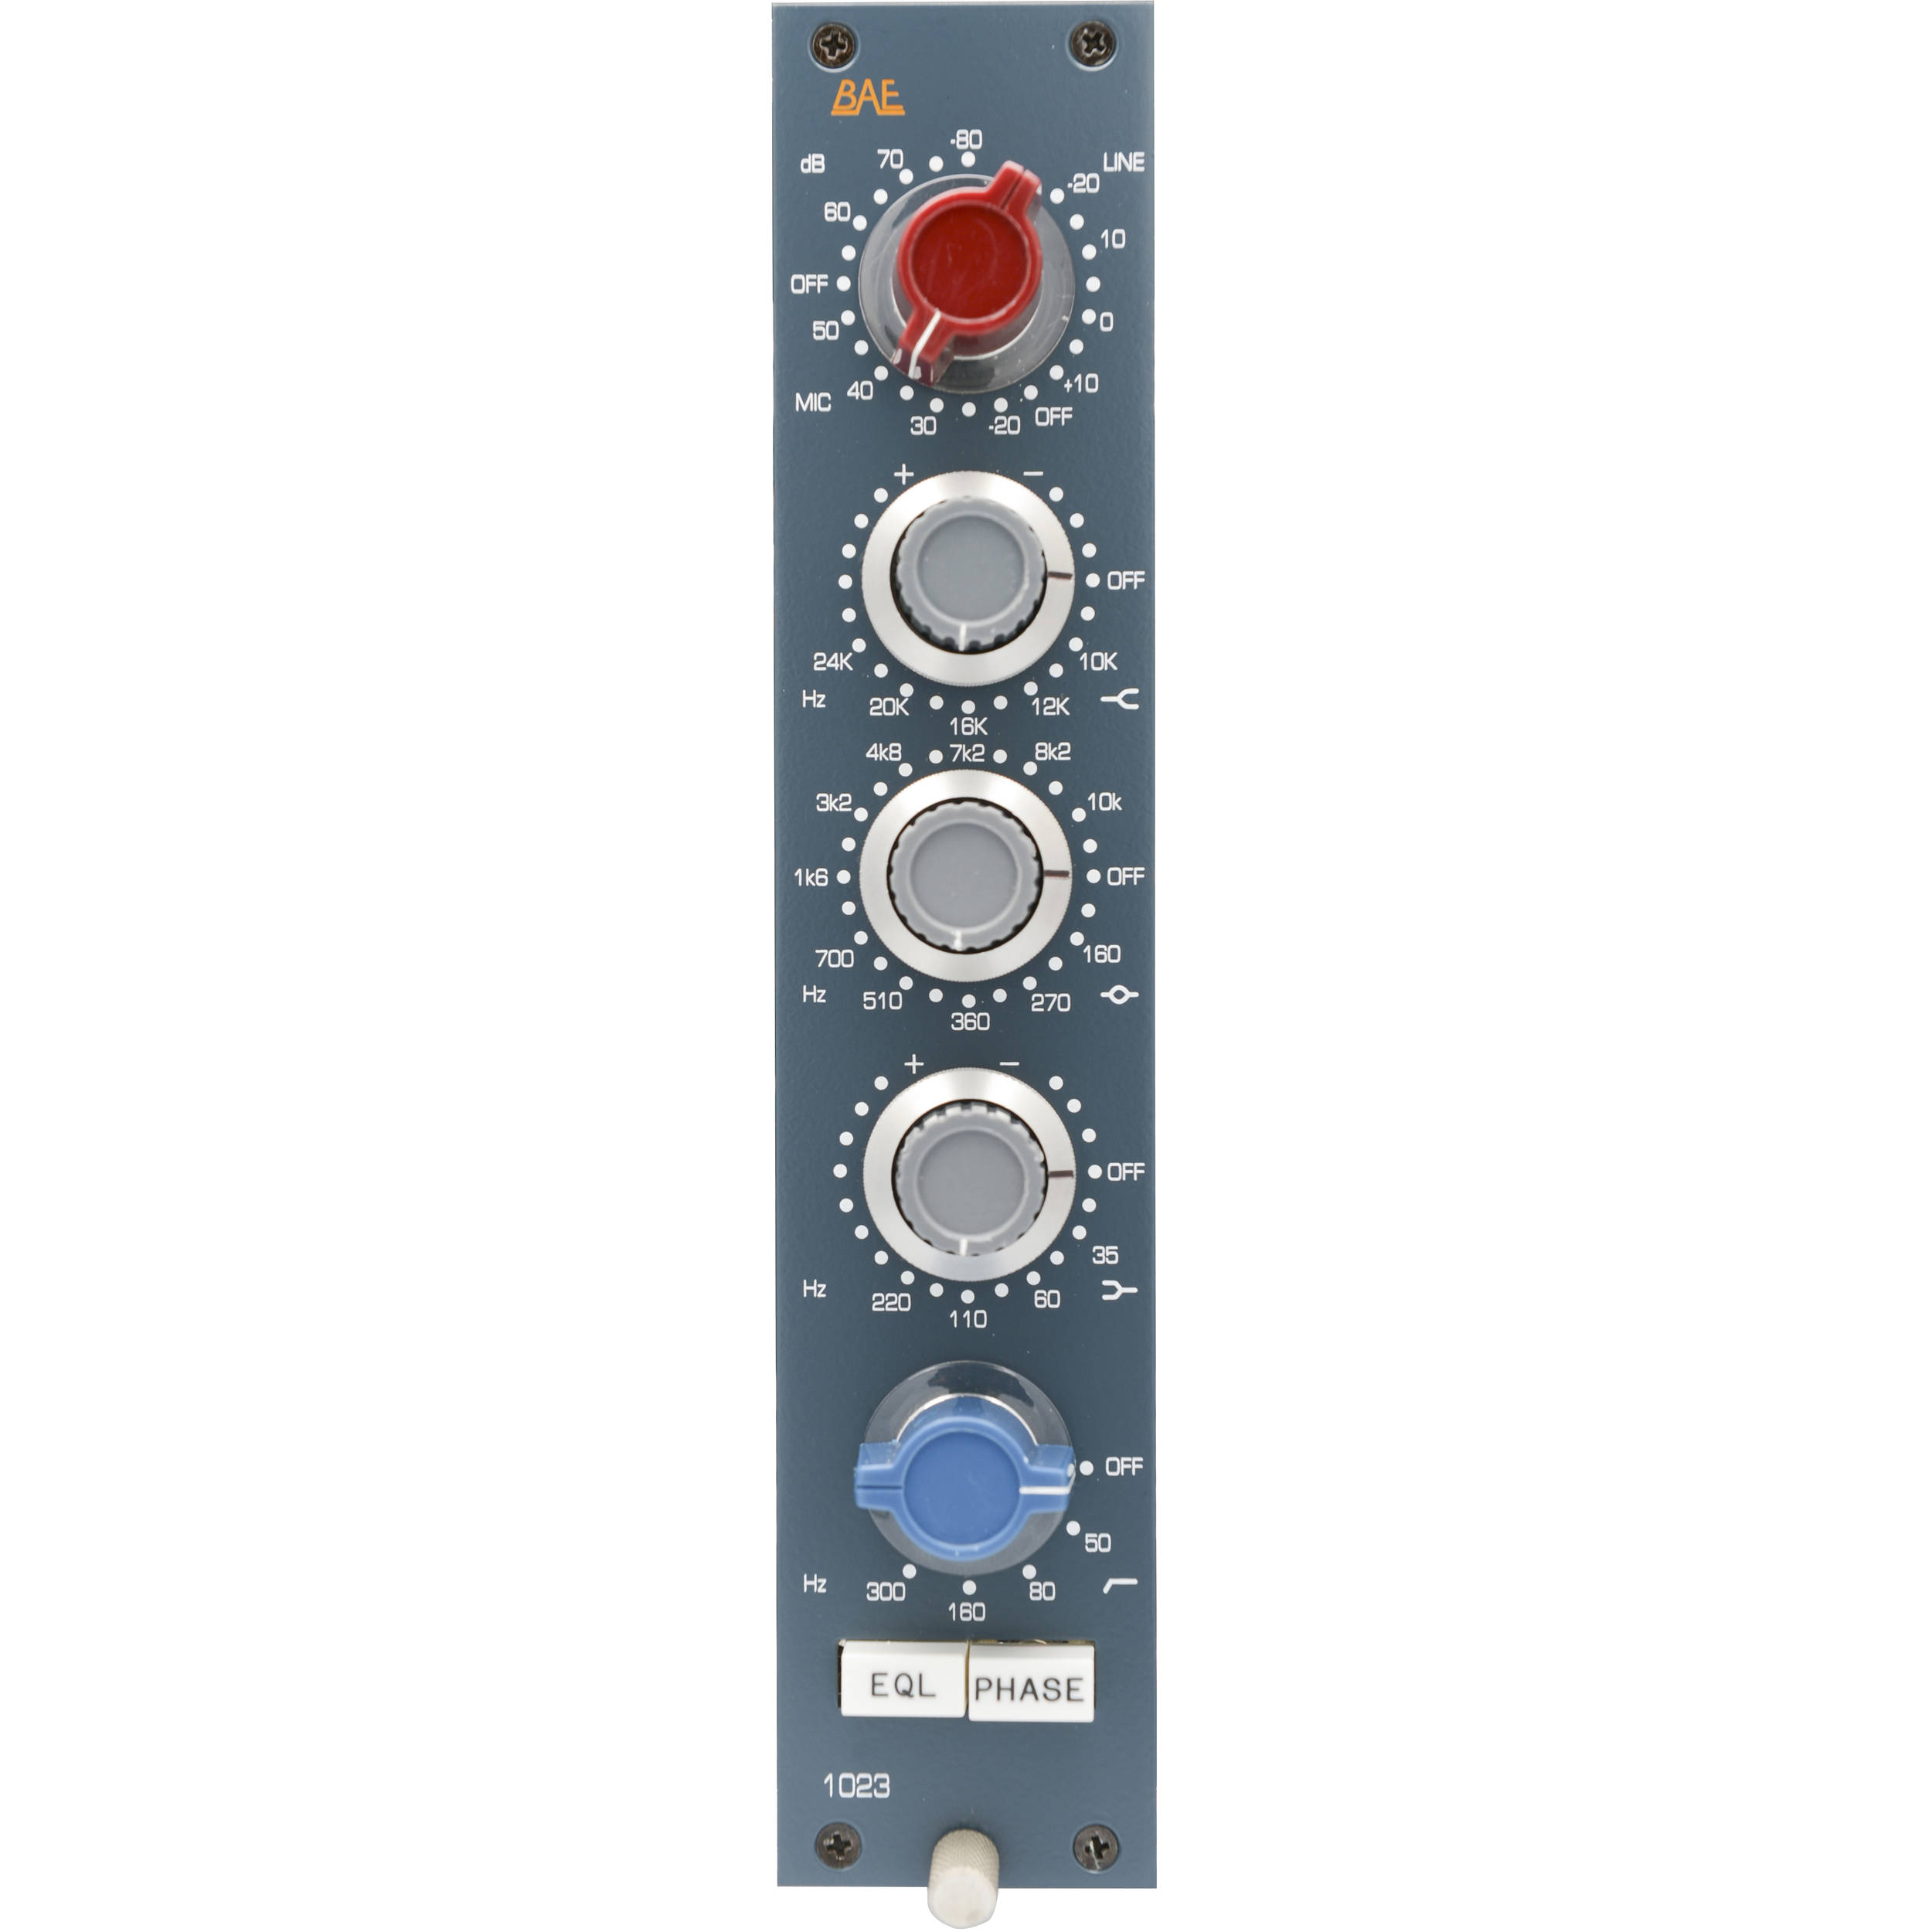 Bae 1023 3 Band Eq Module 1023mod Bh Photo Video Equalizer